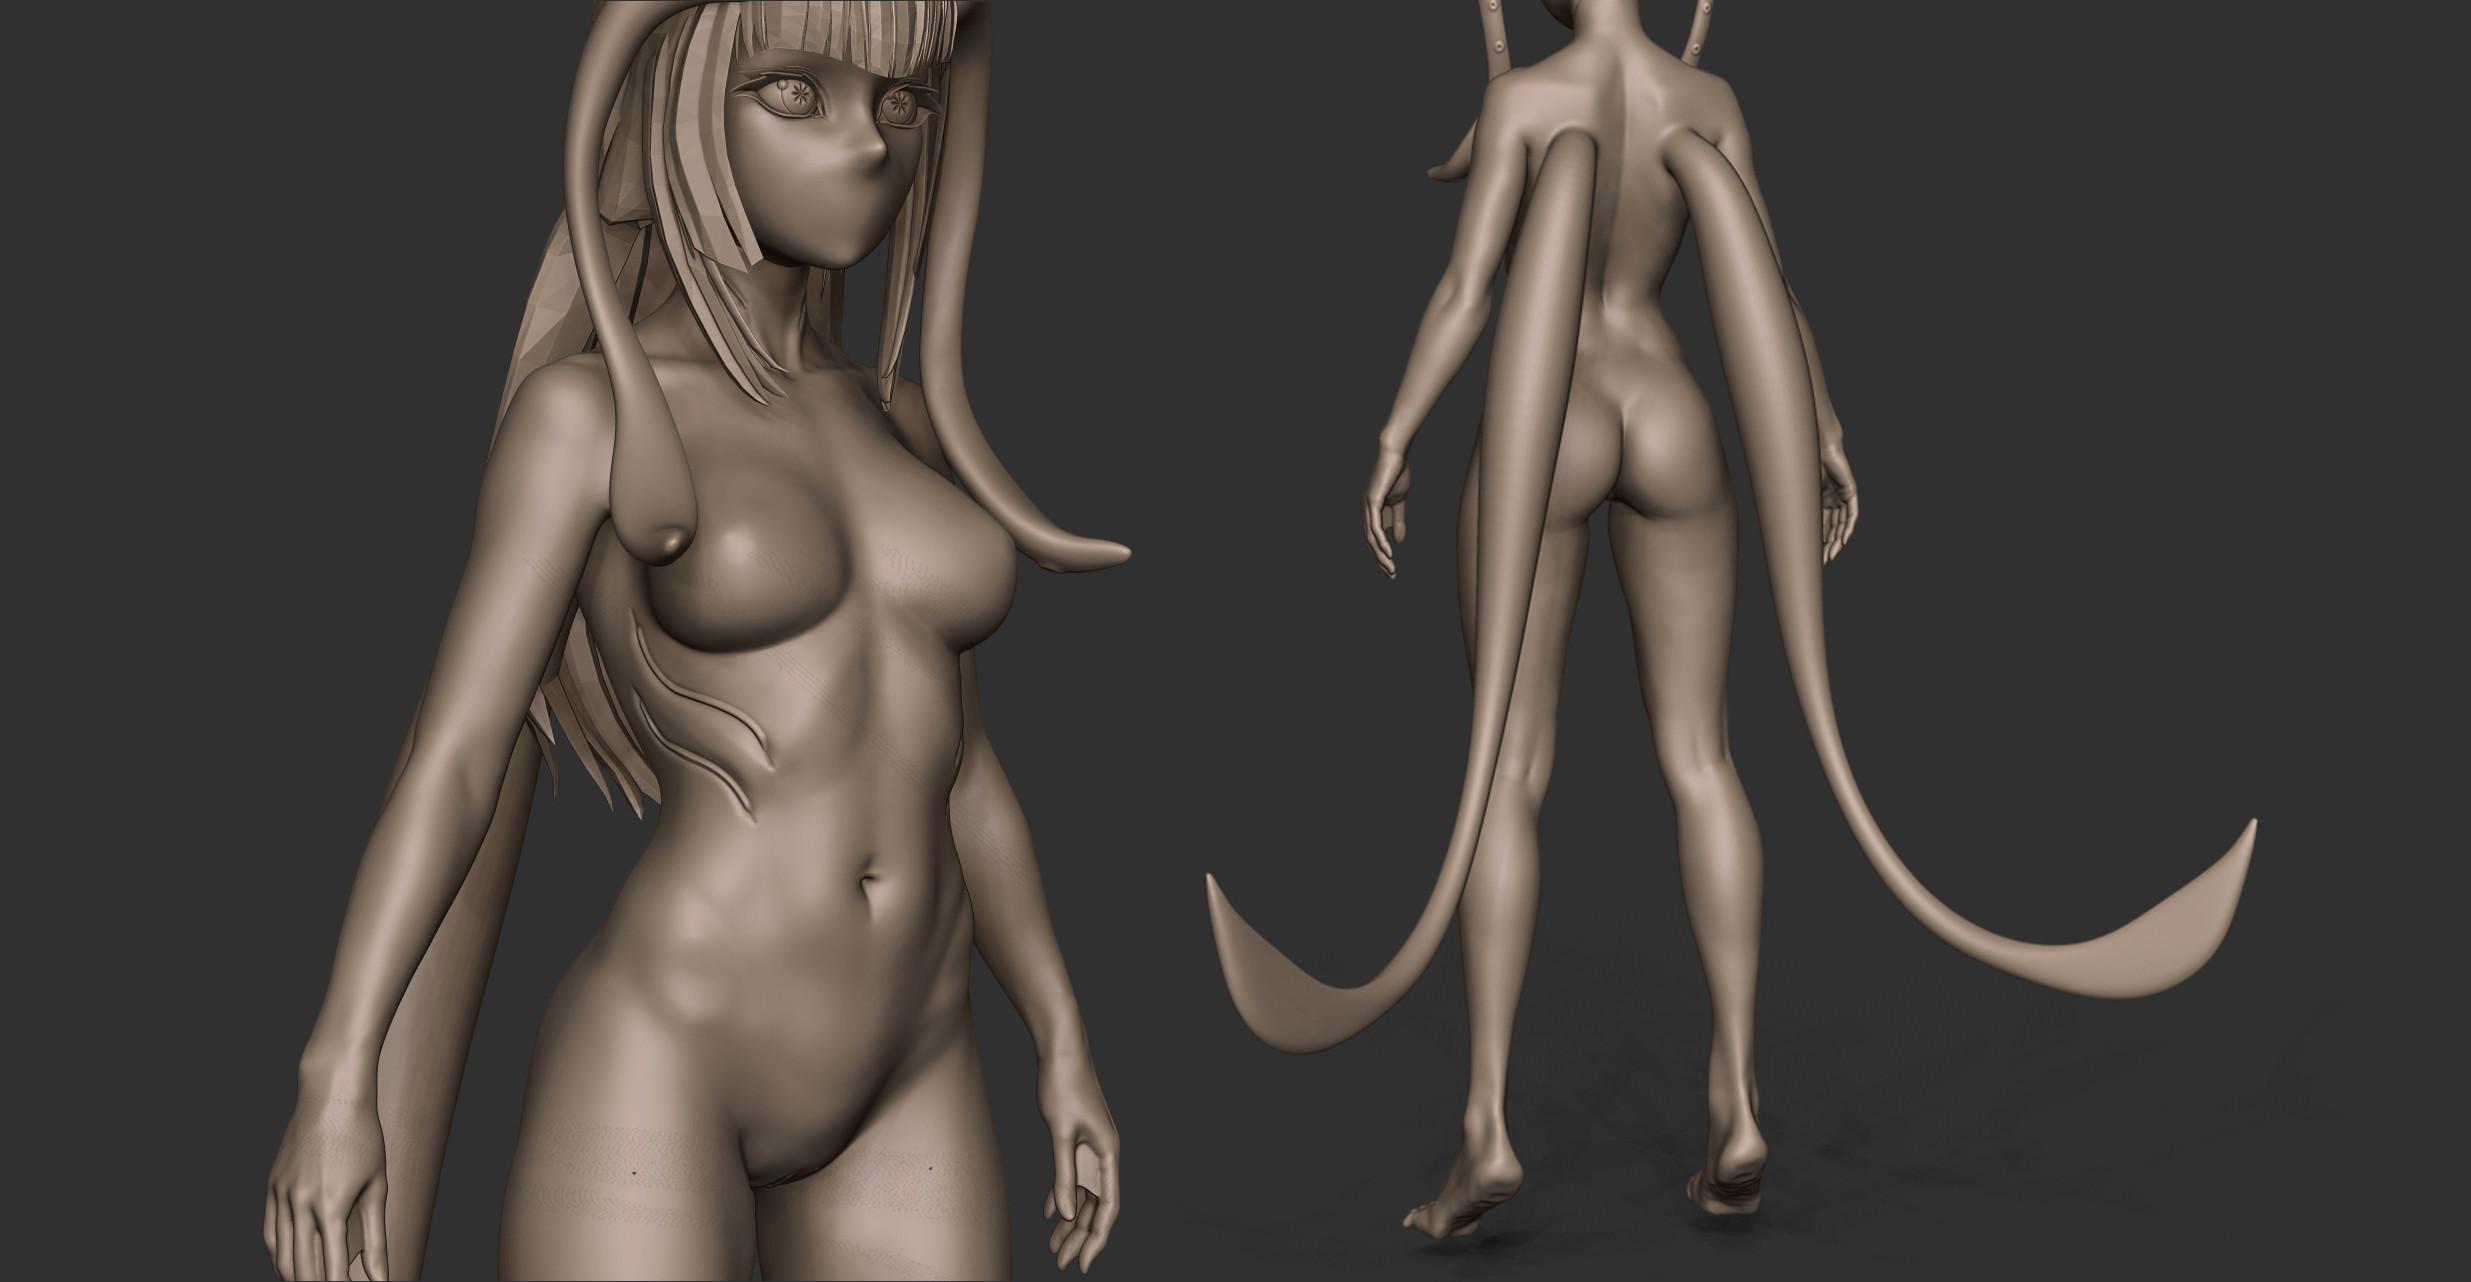 Anatomy Clay render